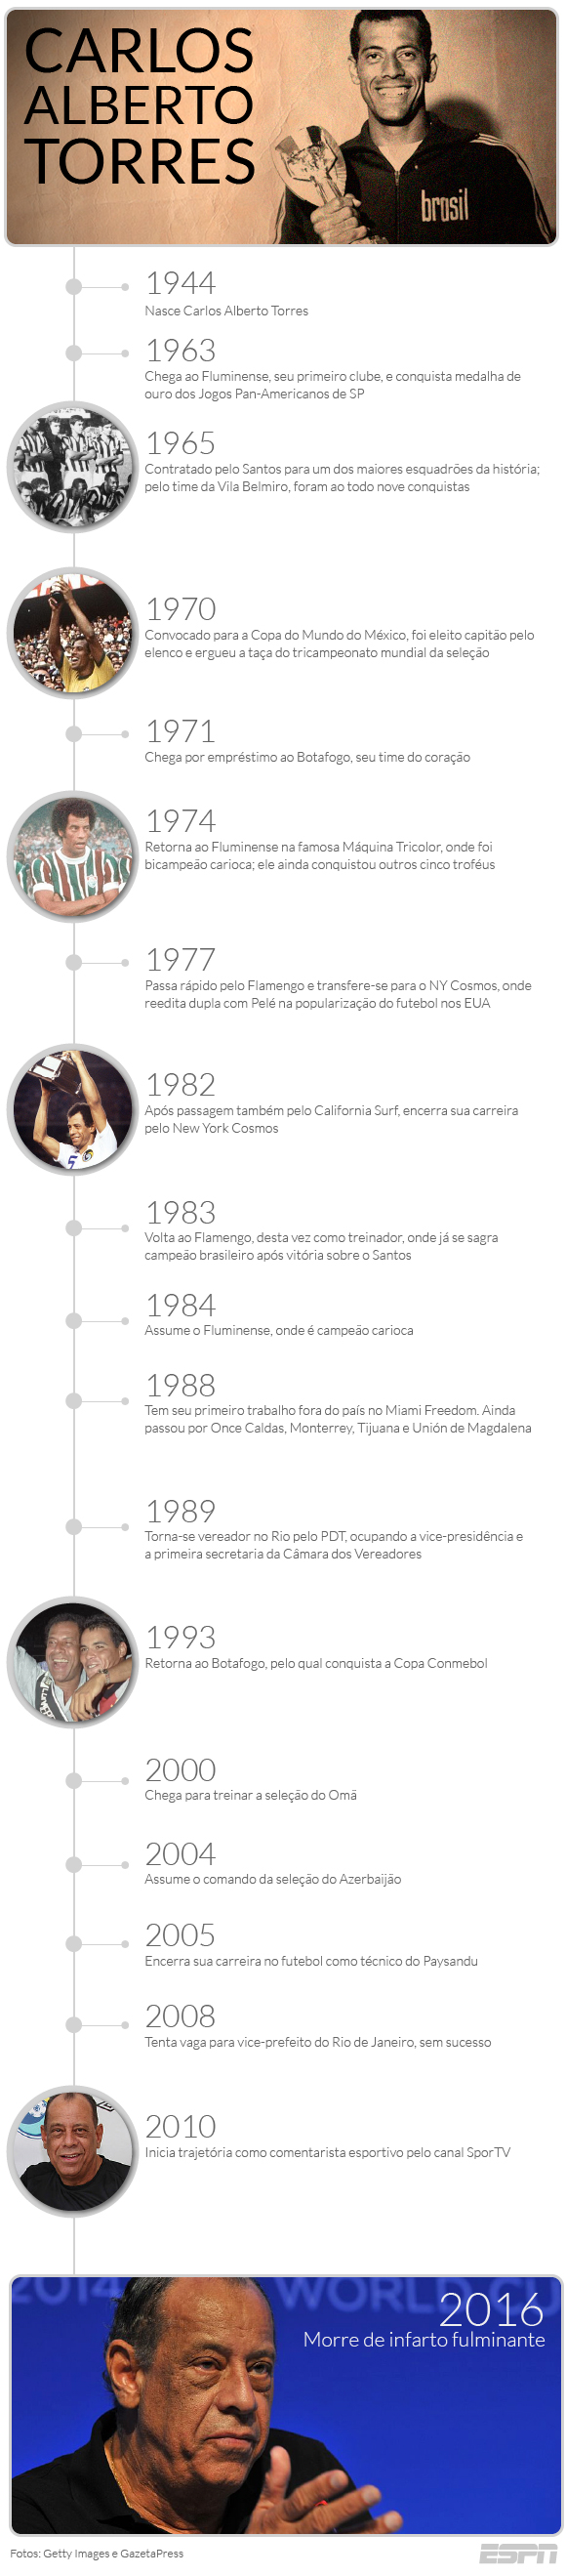 Carlos Alberto Torres Timeline - V2